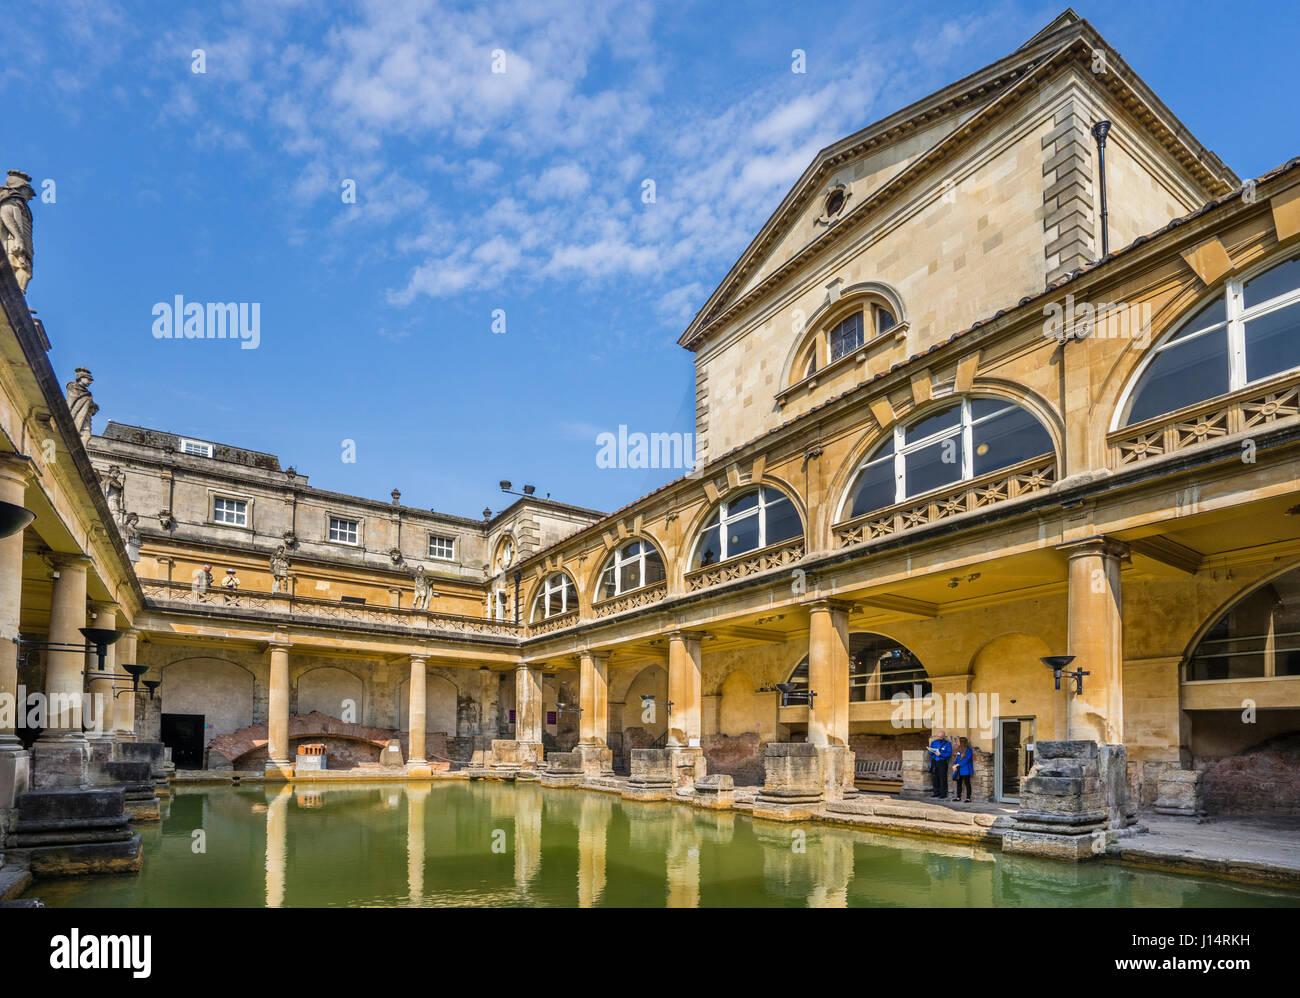 Victorian Bath Stock Photos & Victorian Bath Stock Images - Alamy